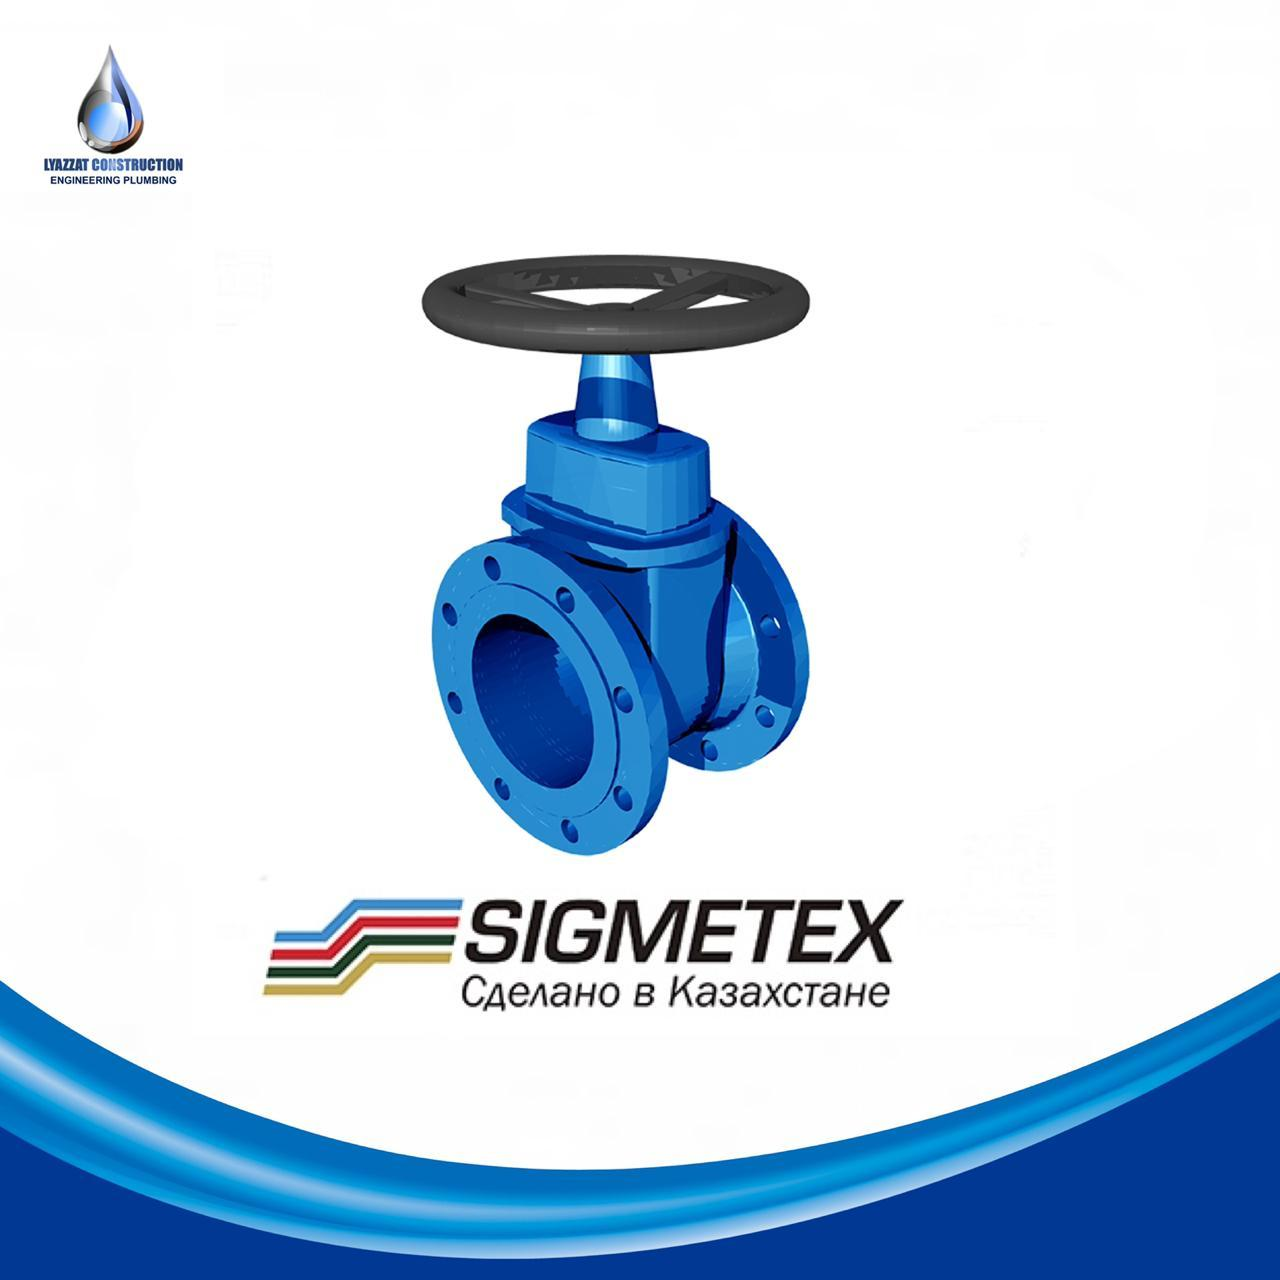 Задвижка Sigmetex DN 300 (Сигметэкс)